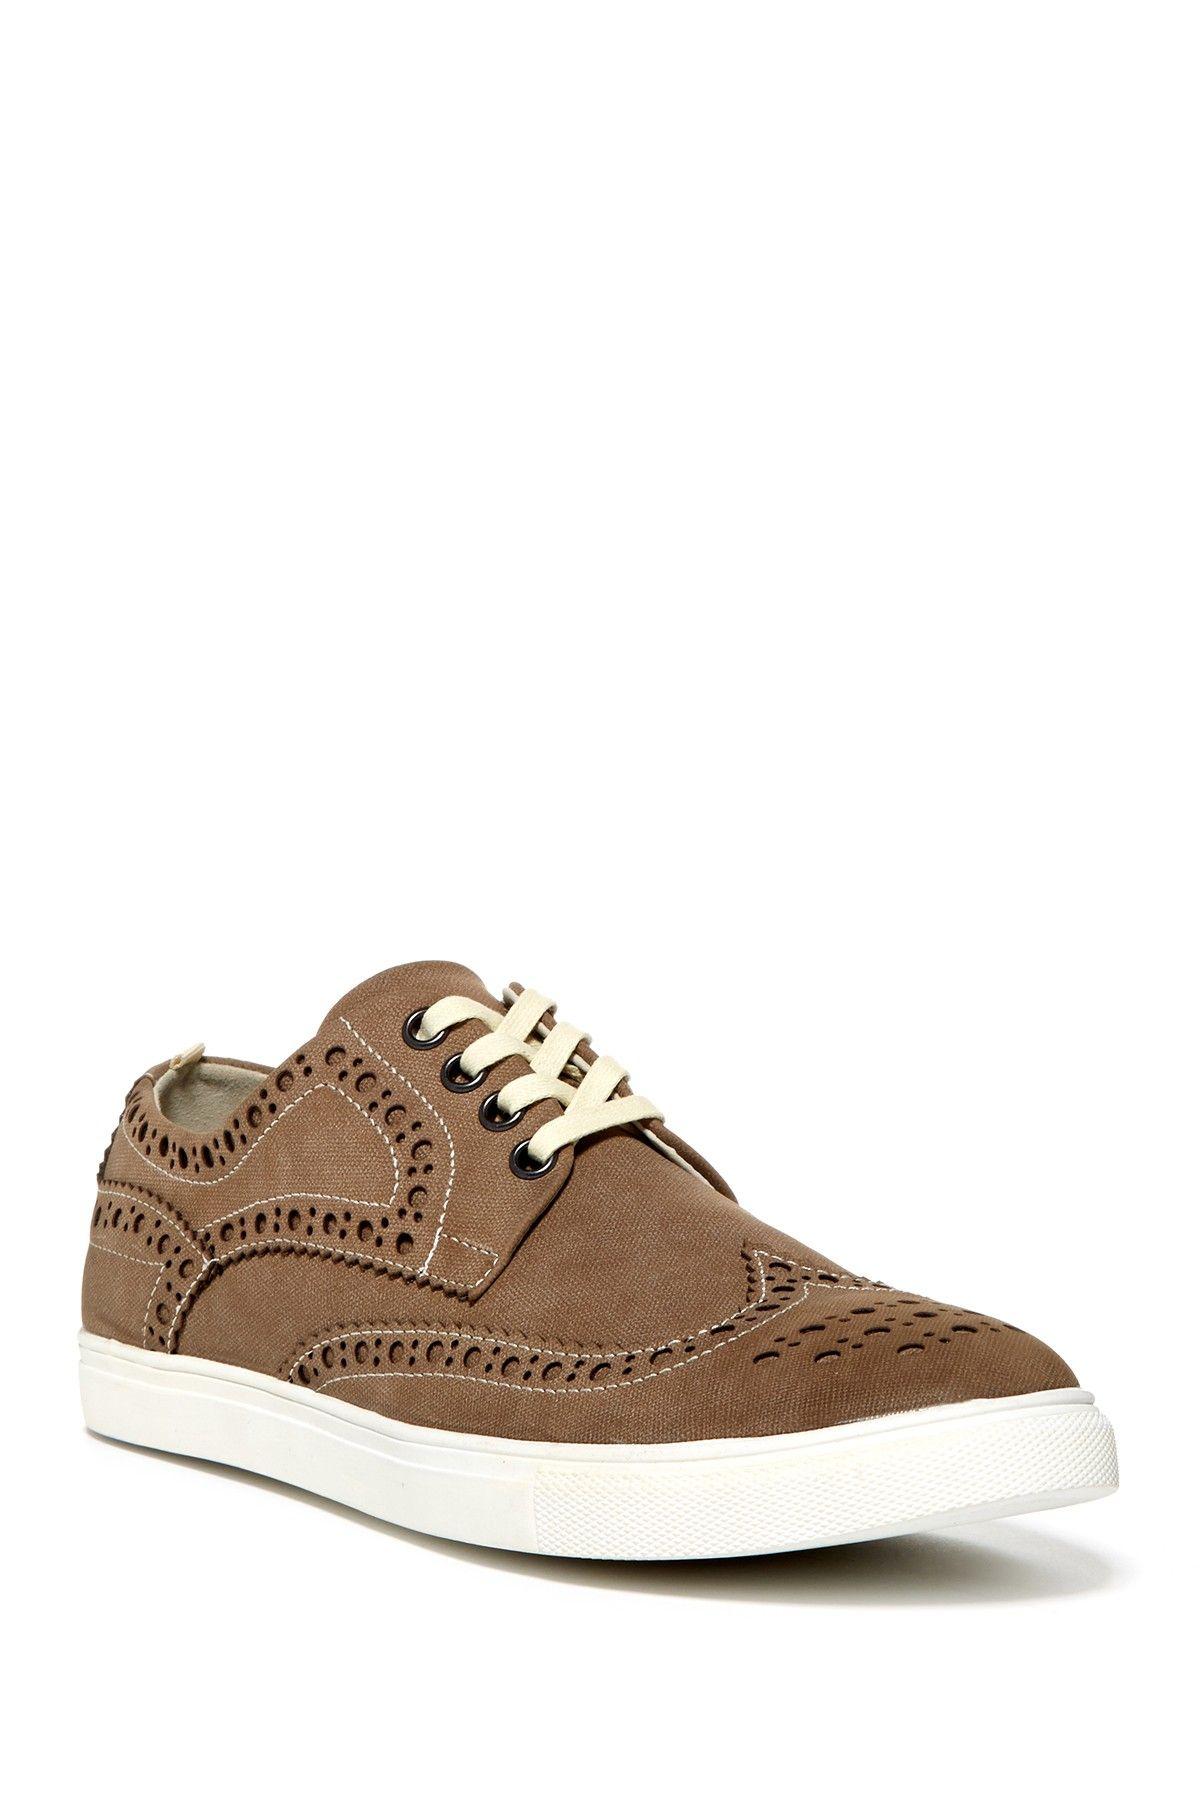 Stand Up Guy Wingtip Sneaker//